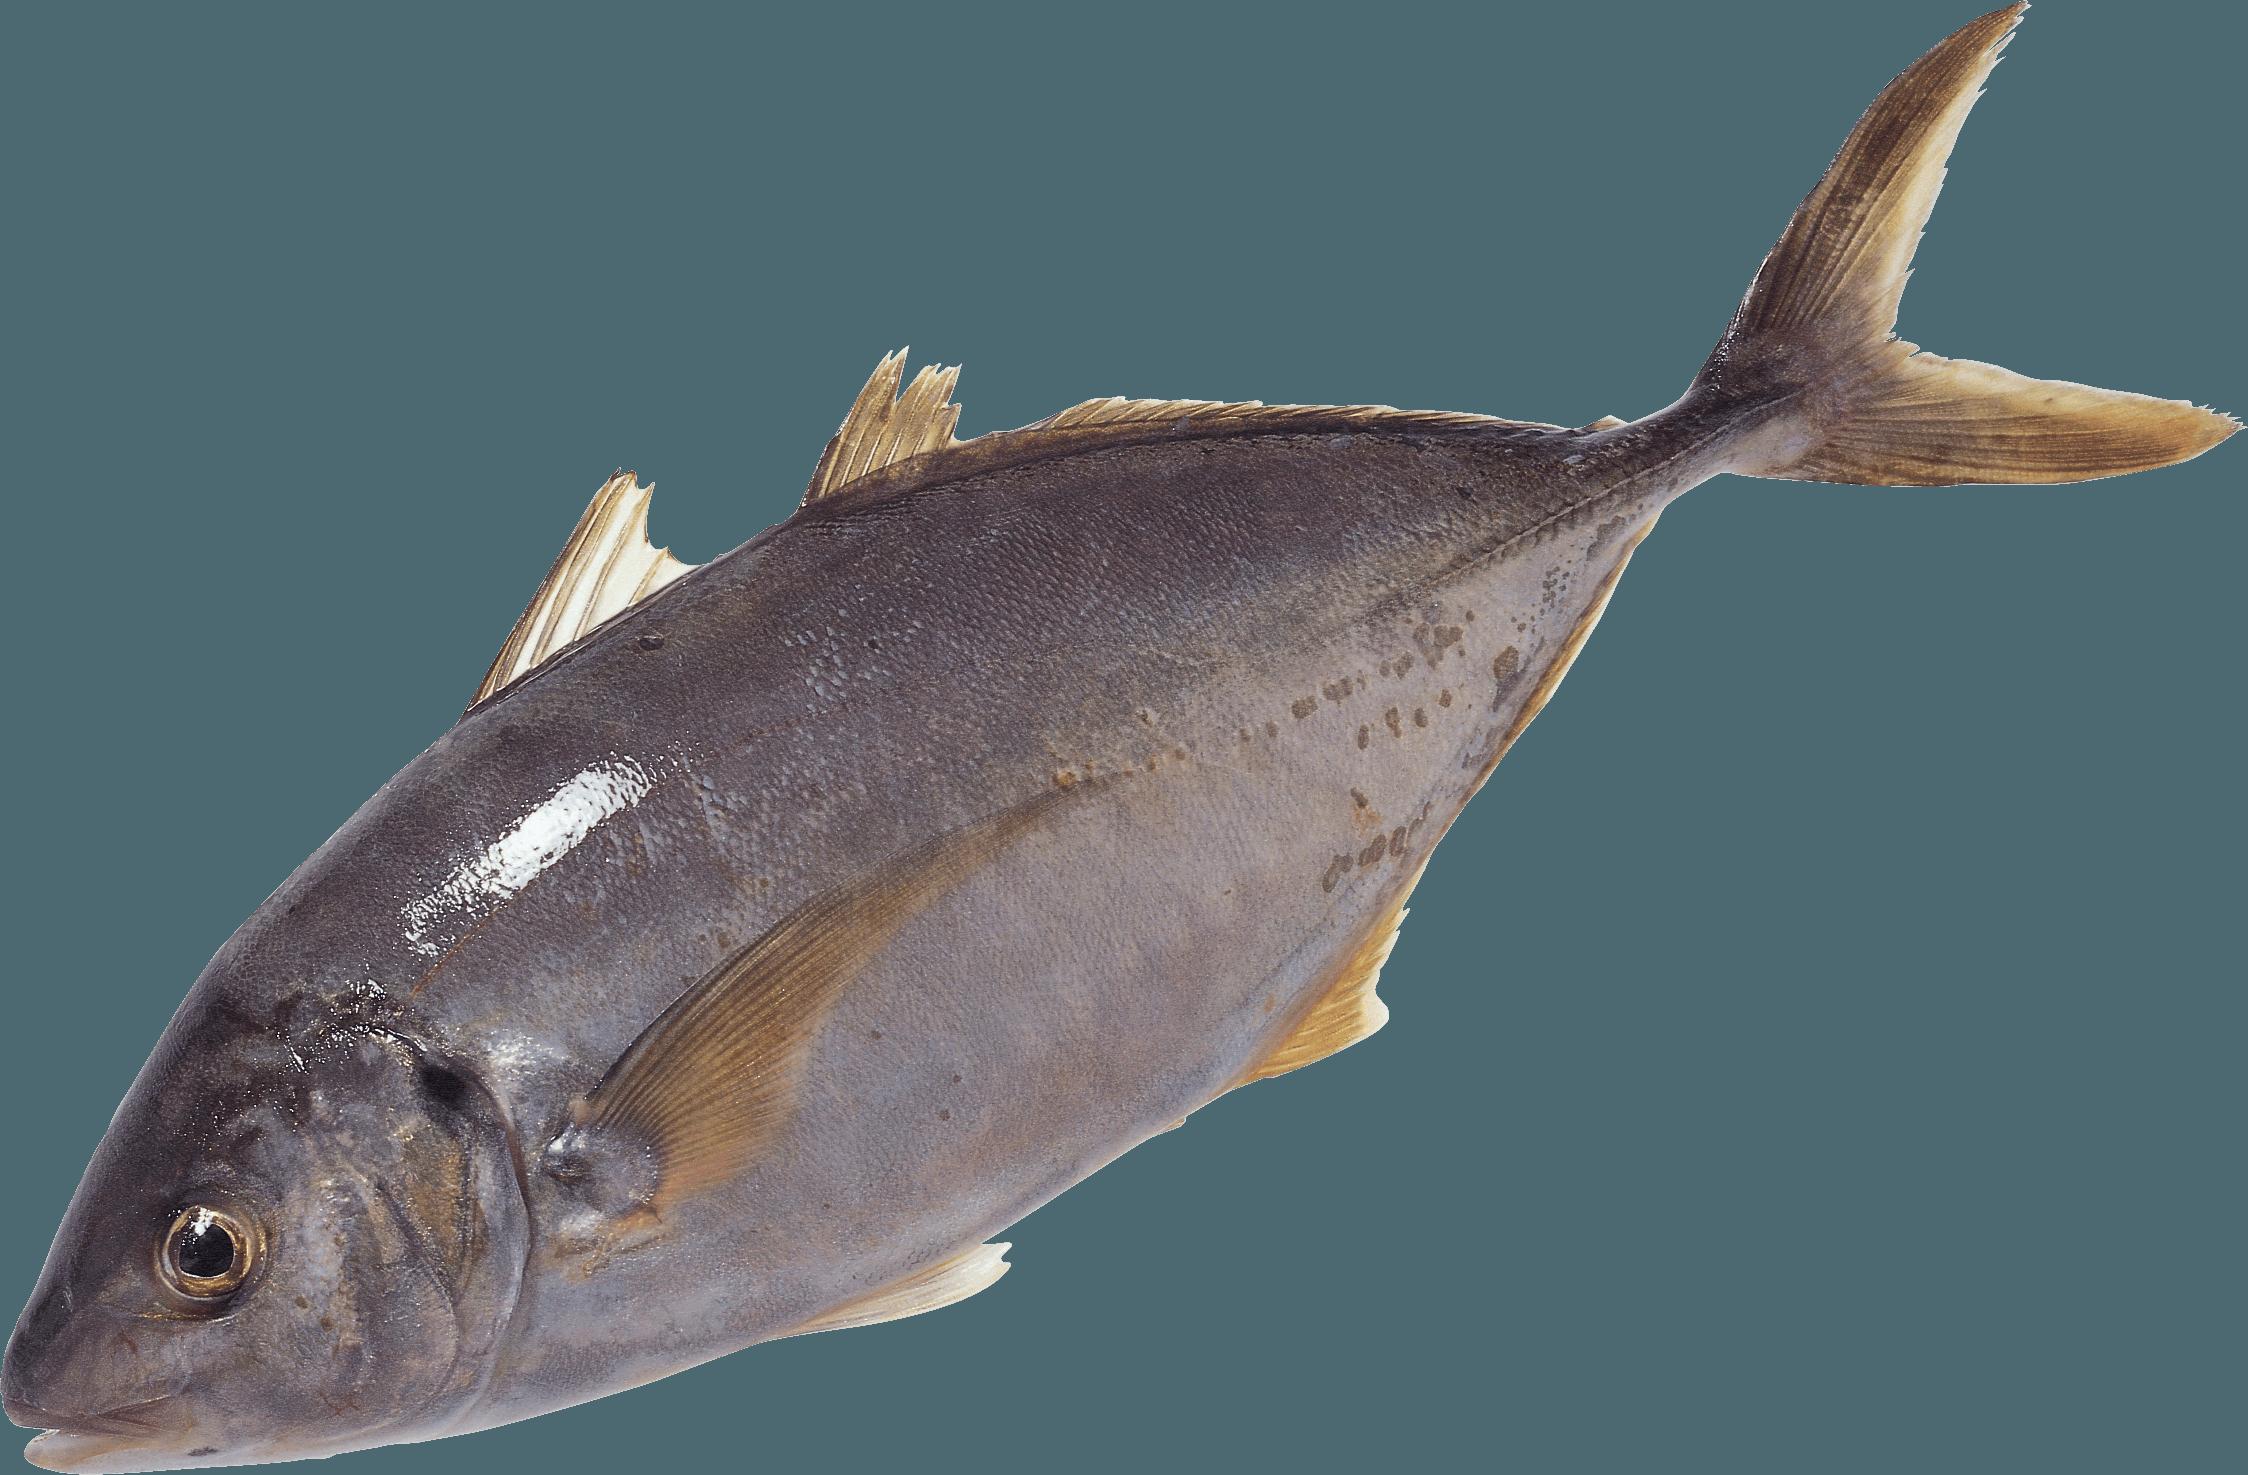 Fish swimming PNG Image